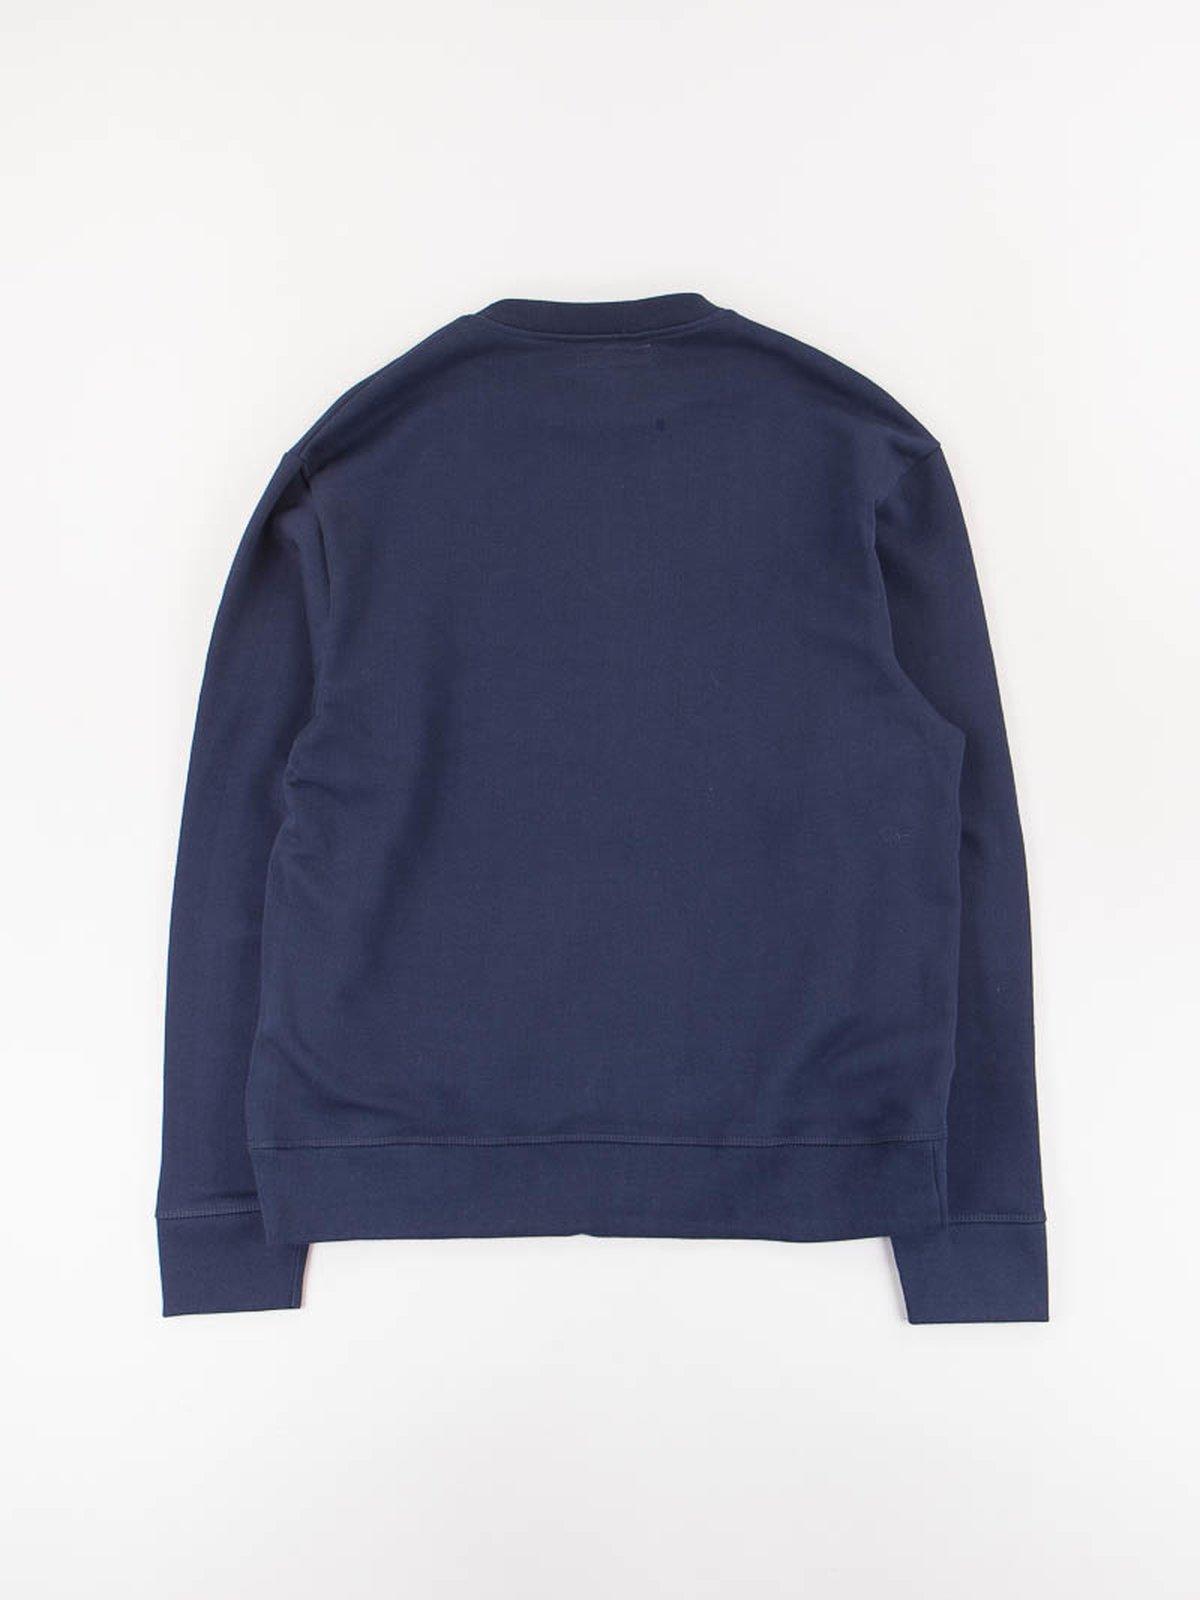 Ink Blue 346OS Organic Cotton Oversized Sweater - Image 5